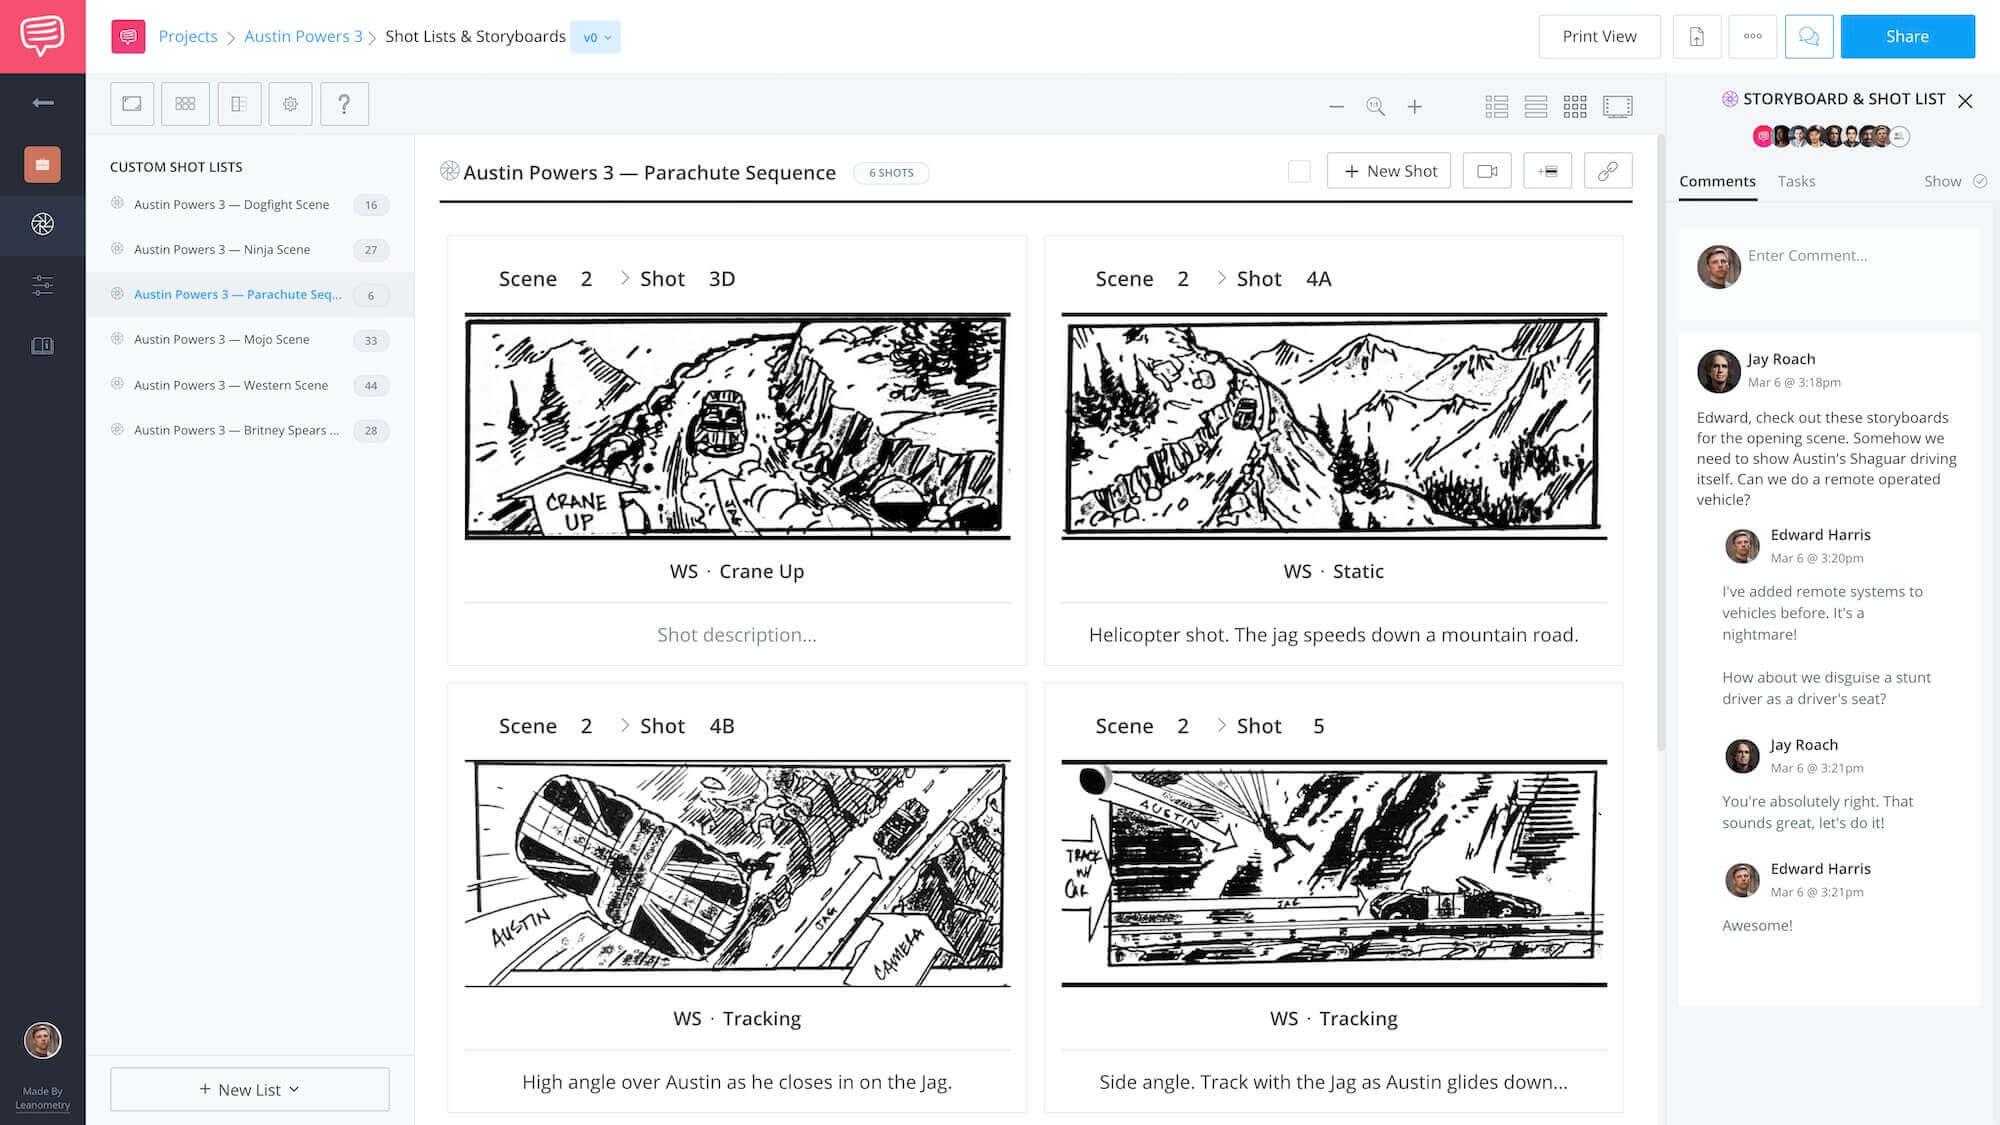 Austin Powers 3 - Seat Double Comments Feature App Tie-In - StudioBinder